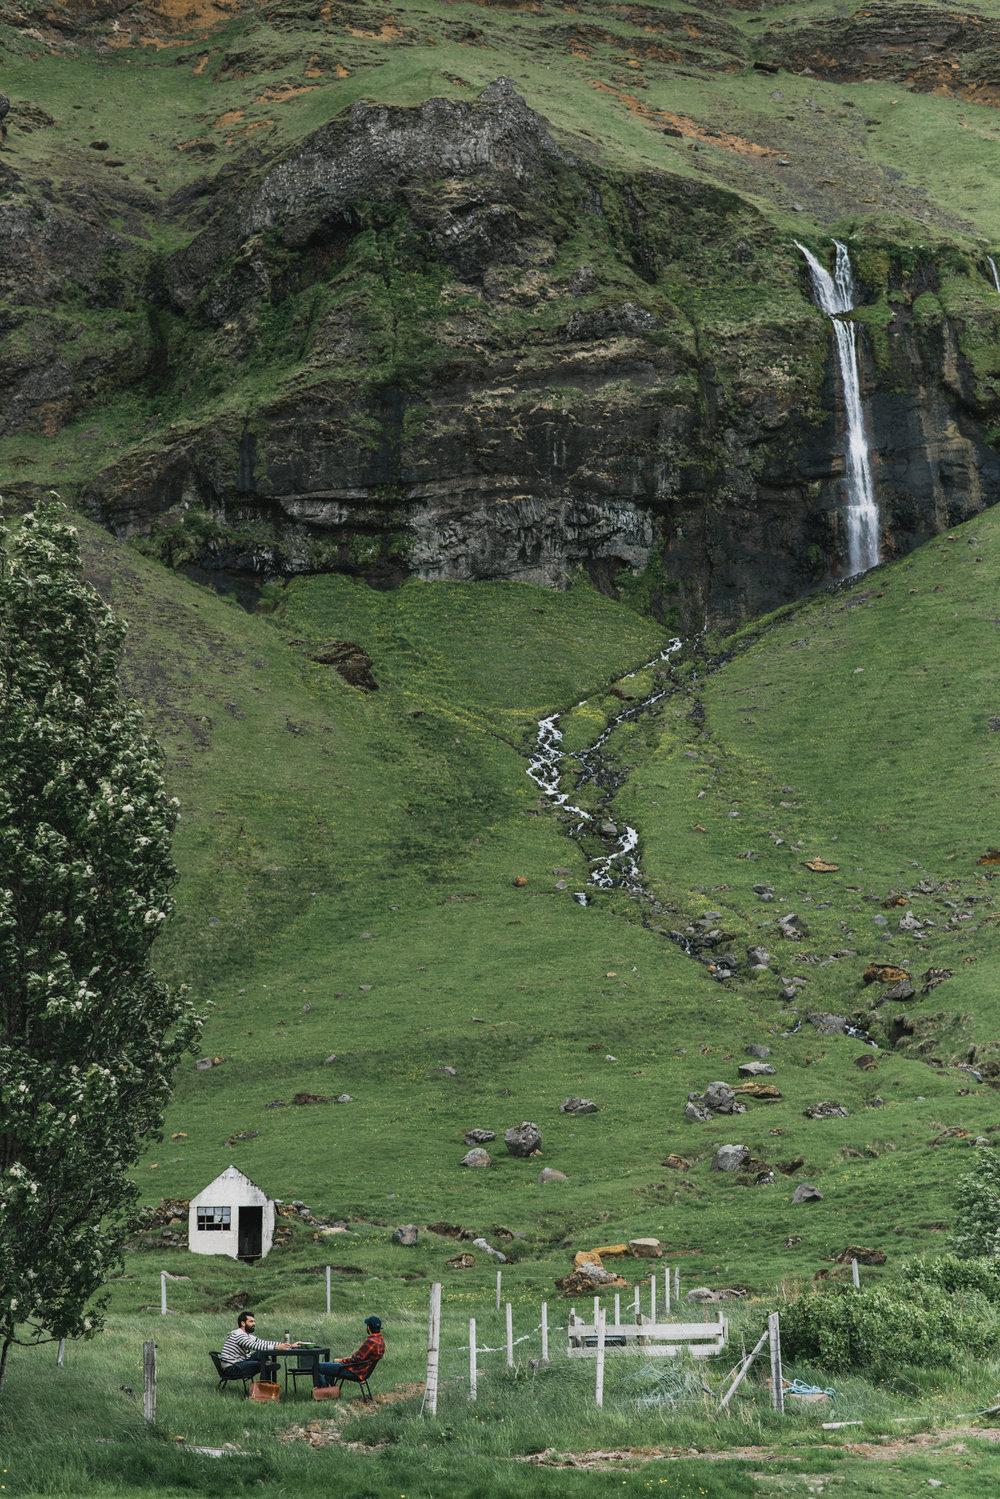 BexarGoods_Iceland_5140.jpg